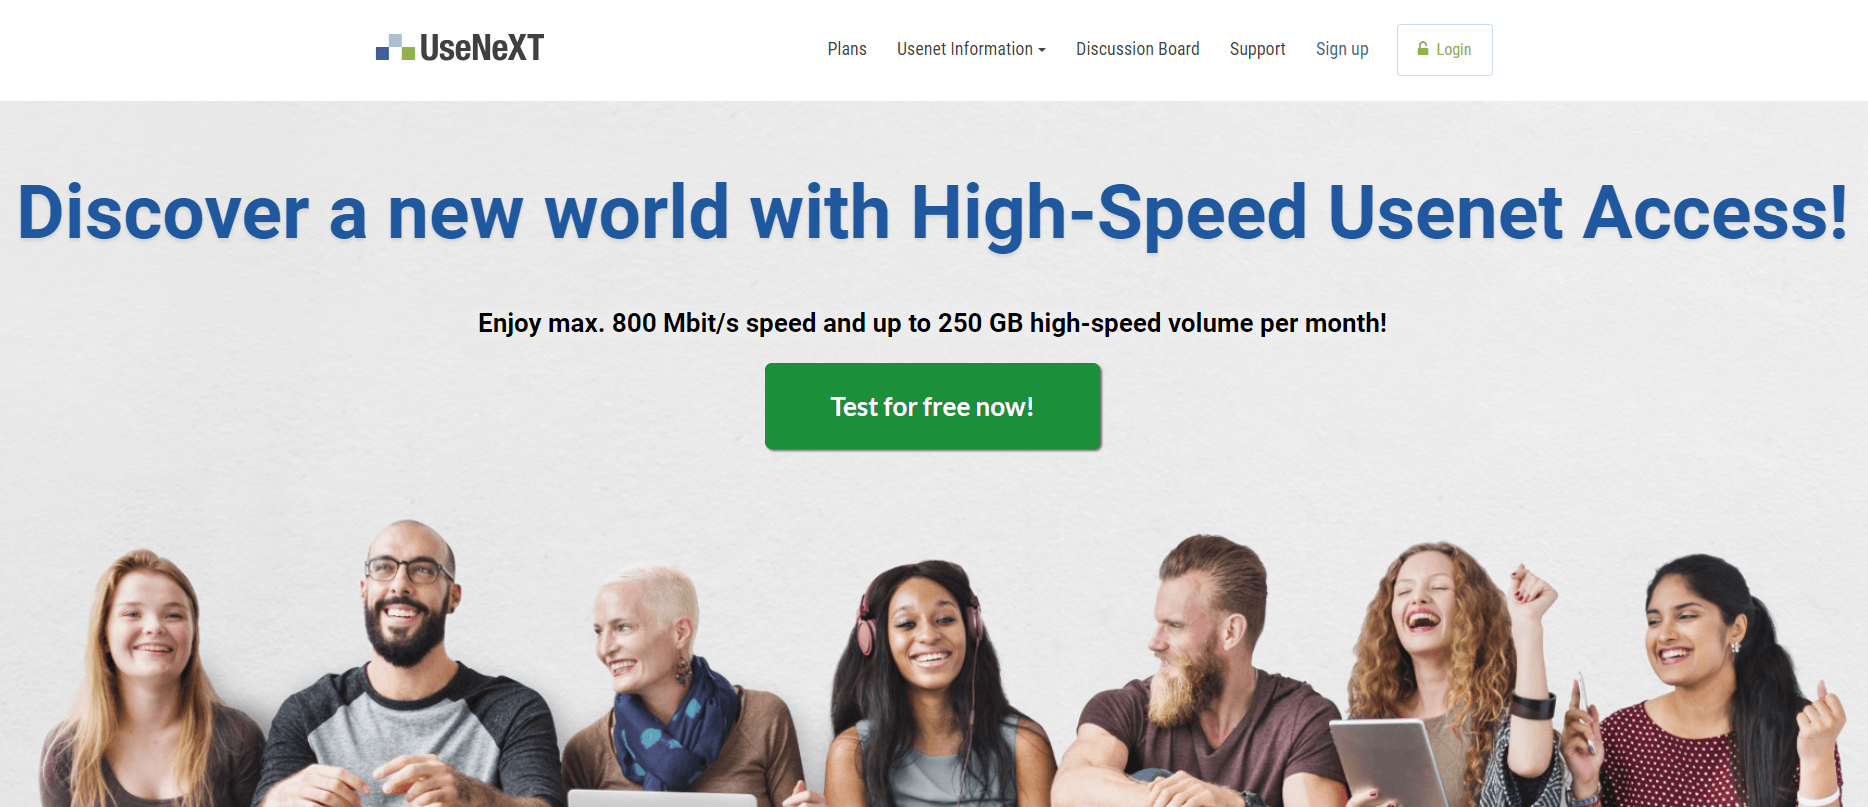 Best European Usenet Providers